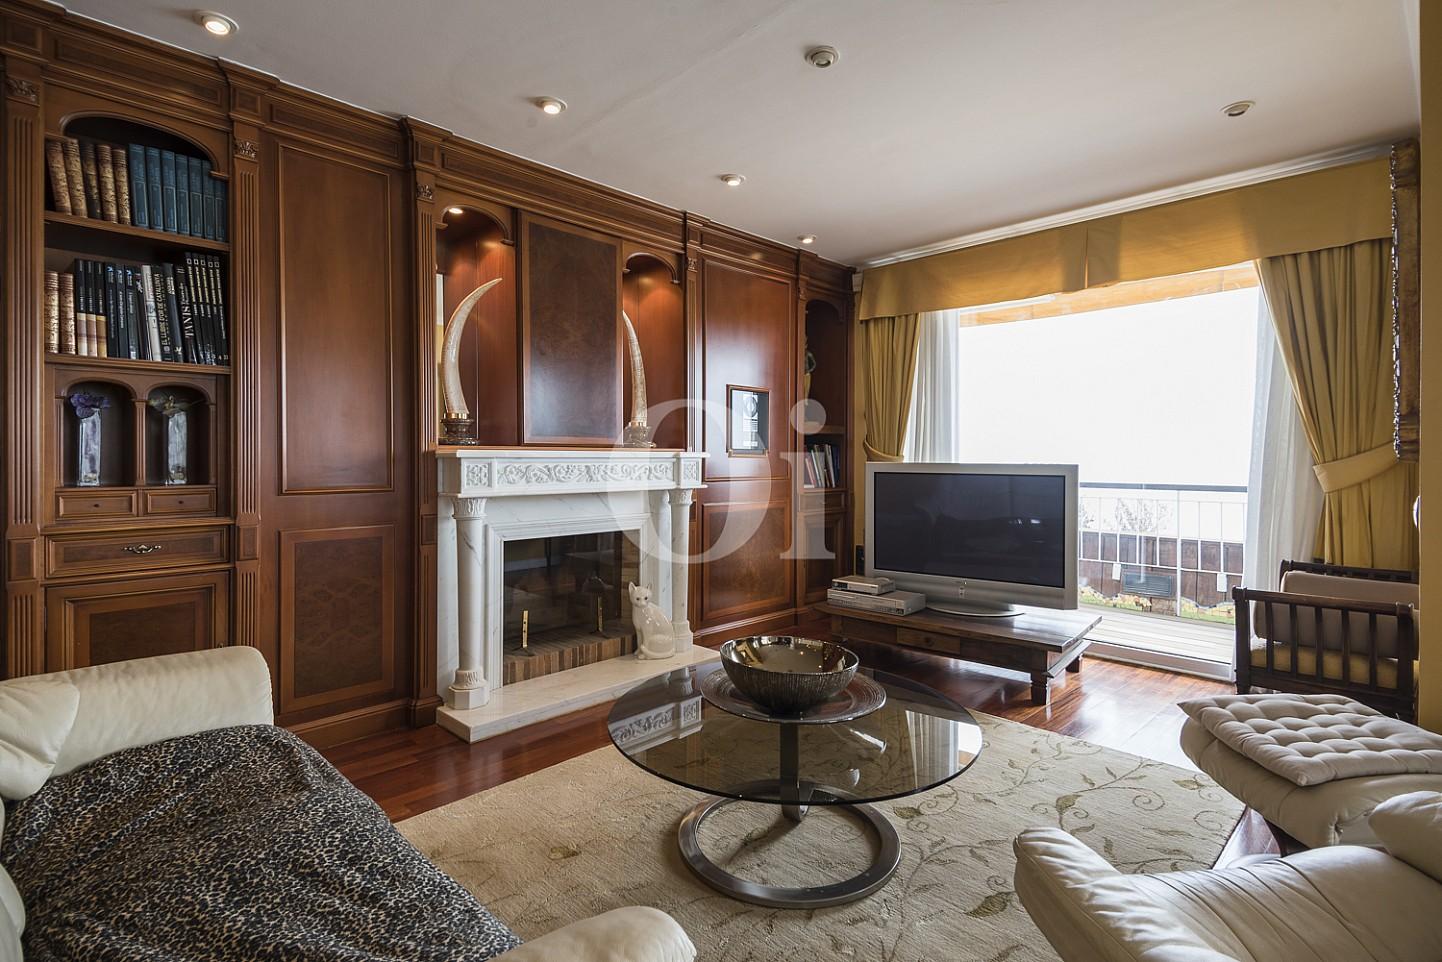 Precioso salón-comedor amplio con chimenea